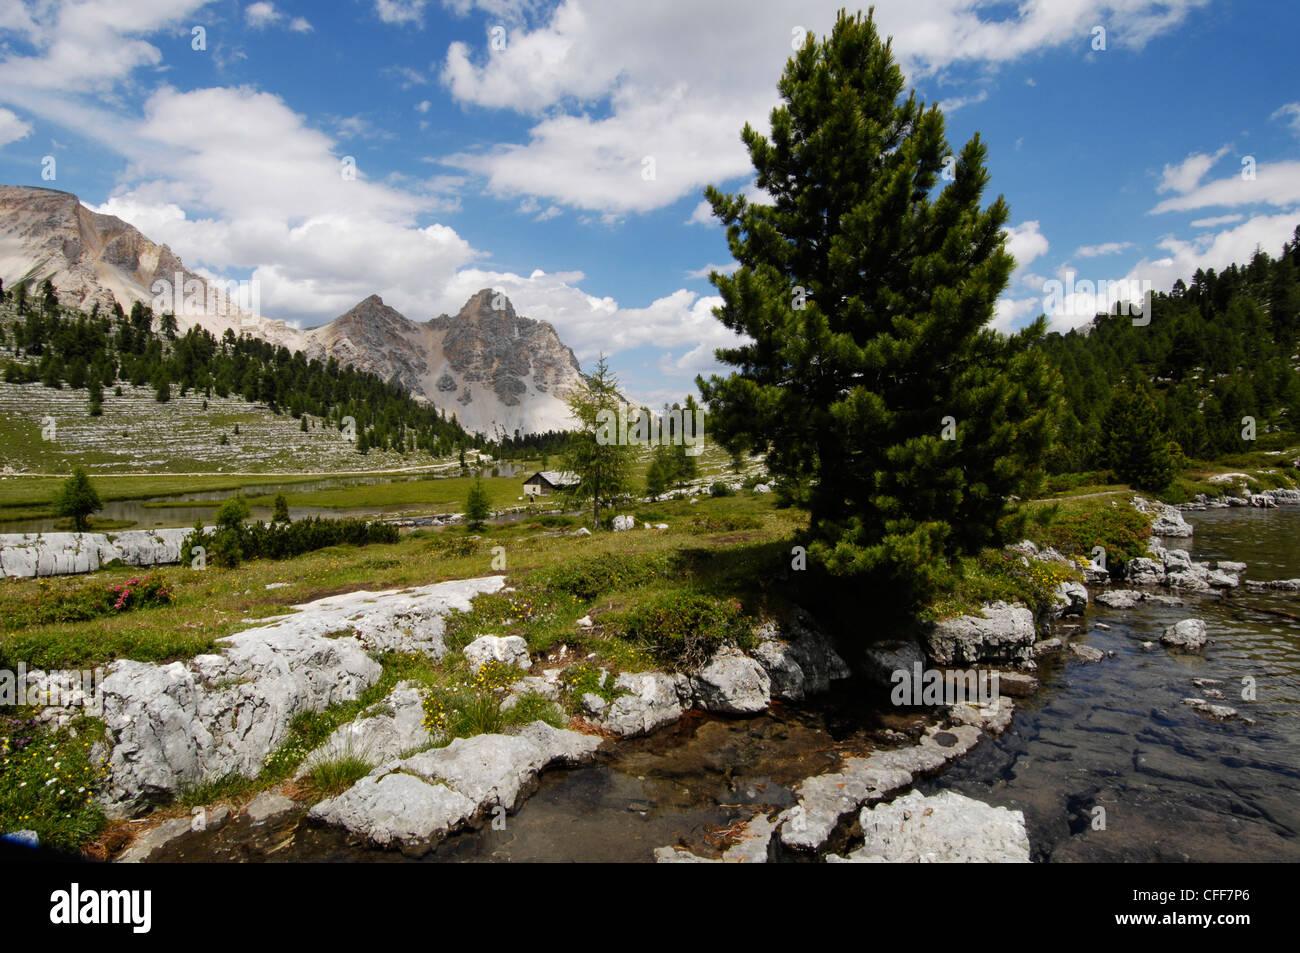 Fanes alp, Gader Valley, Nature Reserve Park Fanes Sennes Prags, Alto Adige, South Tyrol, Italy Stock Photo